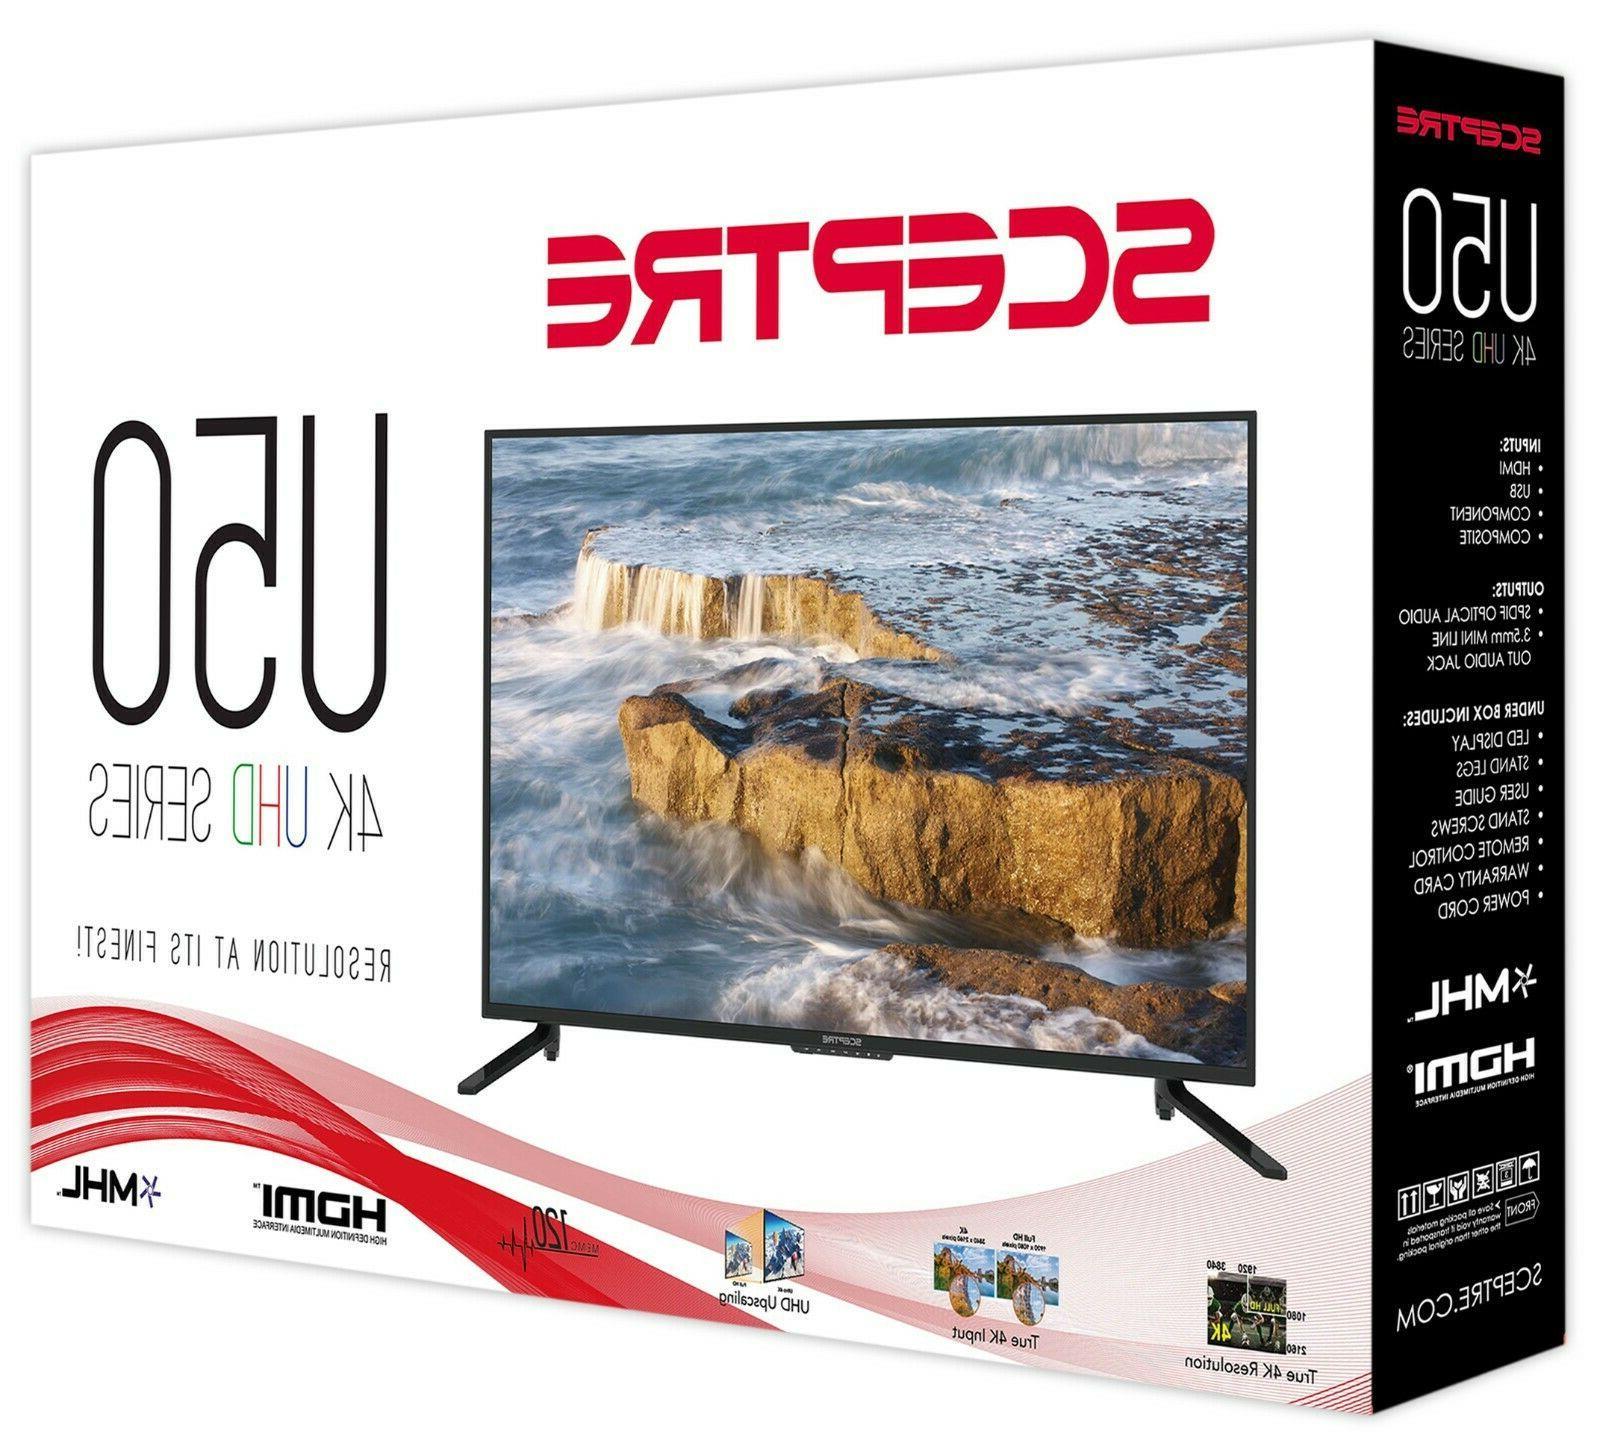 Brand Sceptre 50'' Class 4K TV